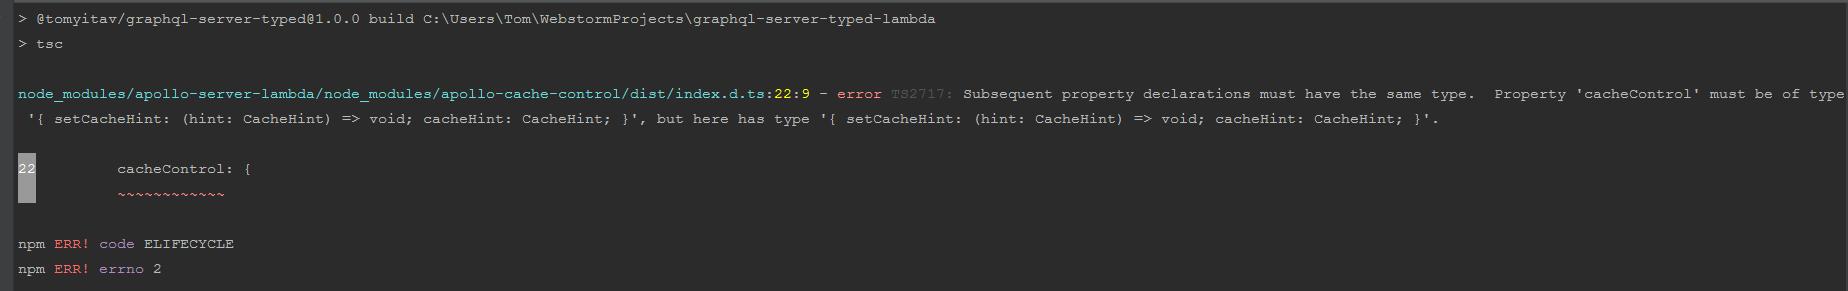 Typescript error in apollo-server-lambda dependency · Issue